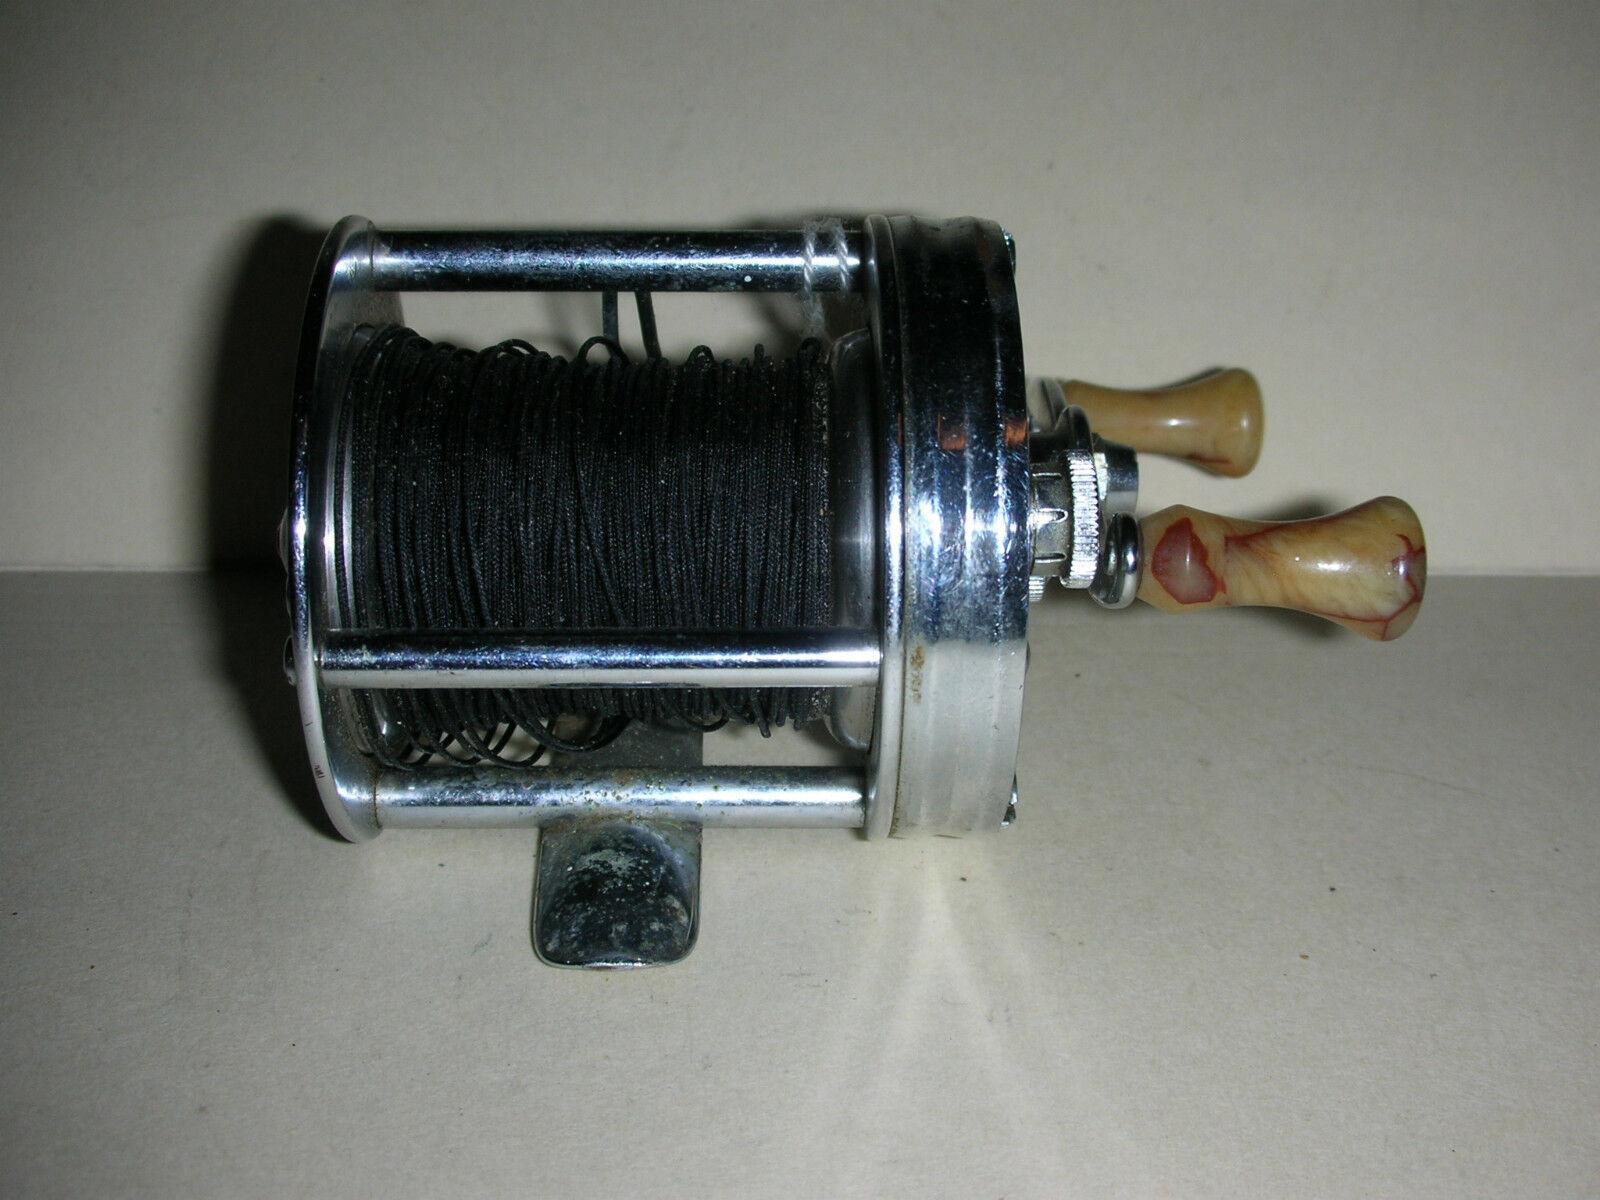 Vintage Shakespeare Criterion 1960 Fishing  Reel - Model GE - USA (G 7)  very popular